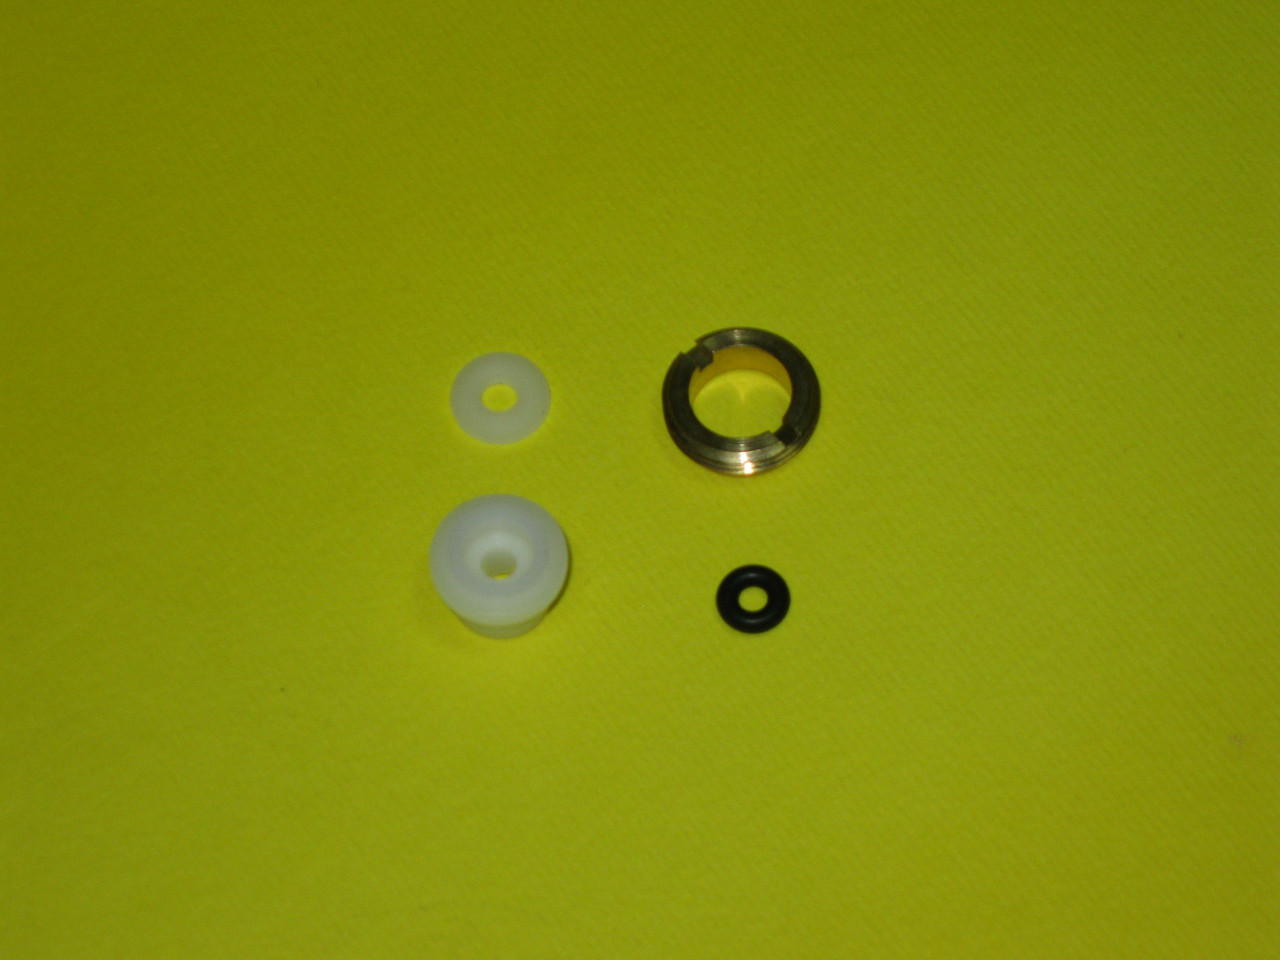 Втулка второпластовая (комплект) трехходового клапана Hermann, Immergas, Sime, Nobel, Protherm